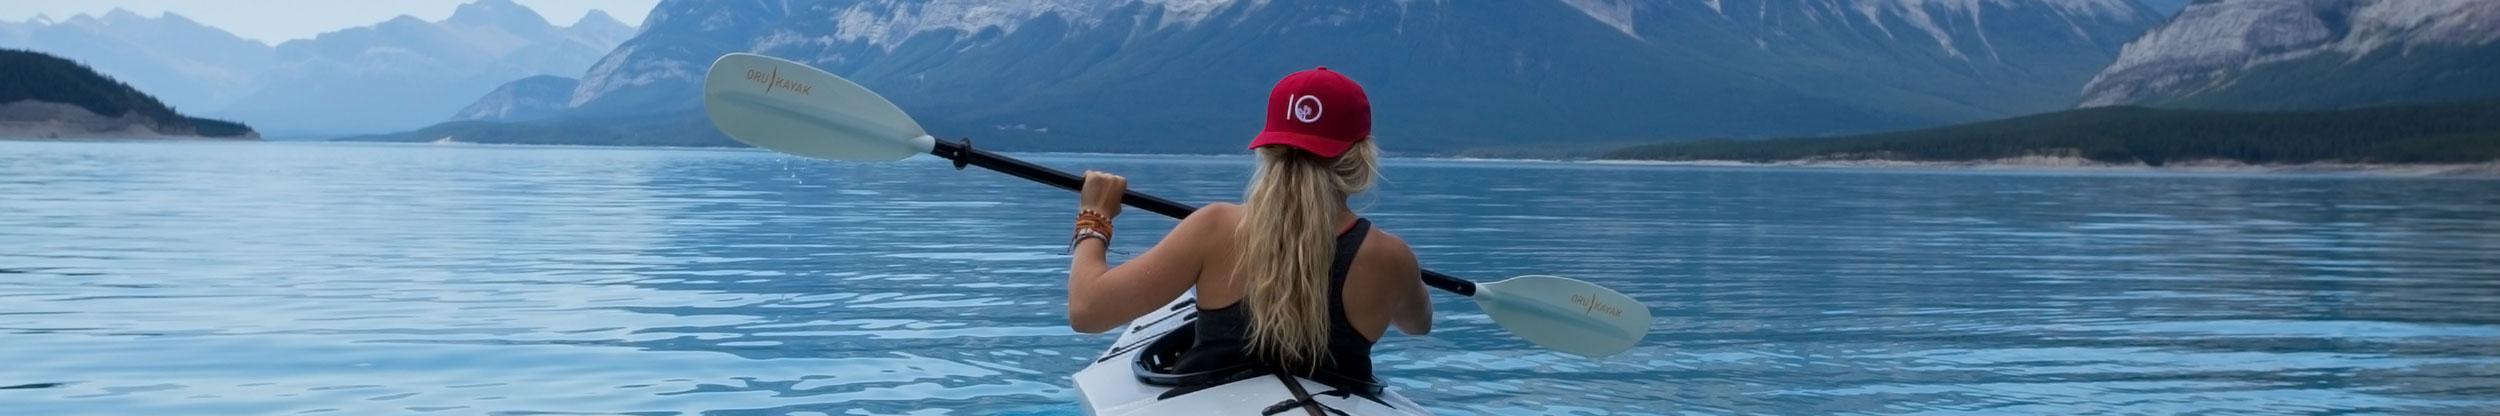 Frau im Kanu in Kanada